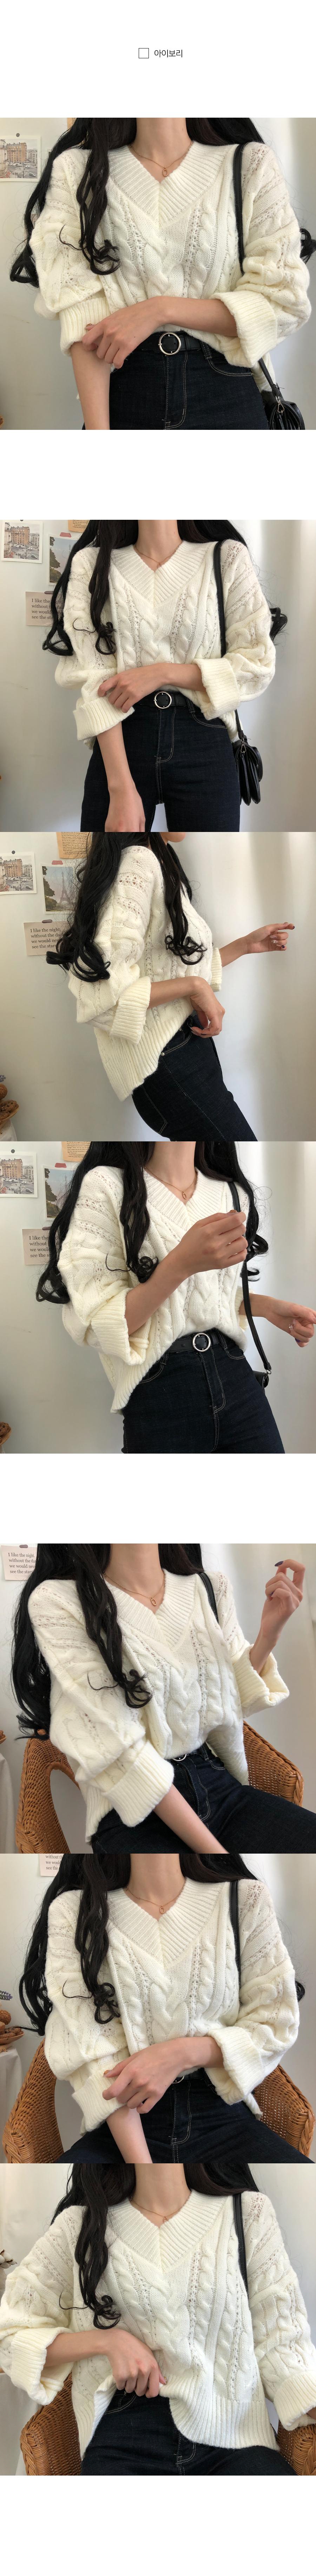 V-Neck Twisted Knitwear like a puff cream